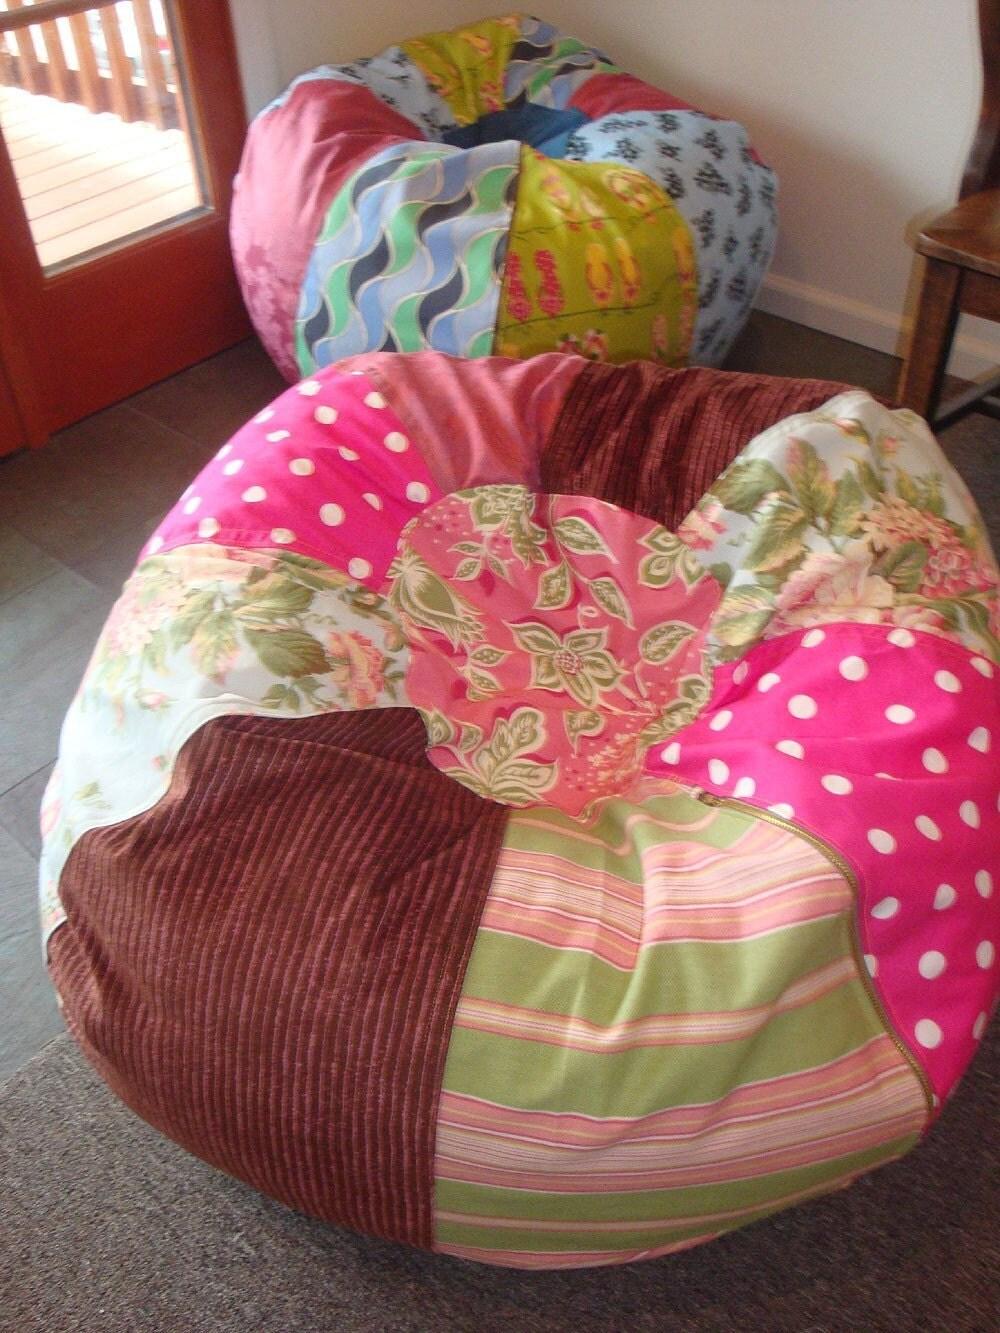 Cottage Chic Bean Bag Chair